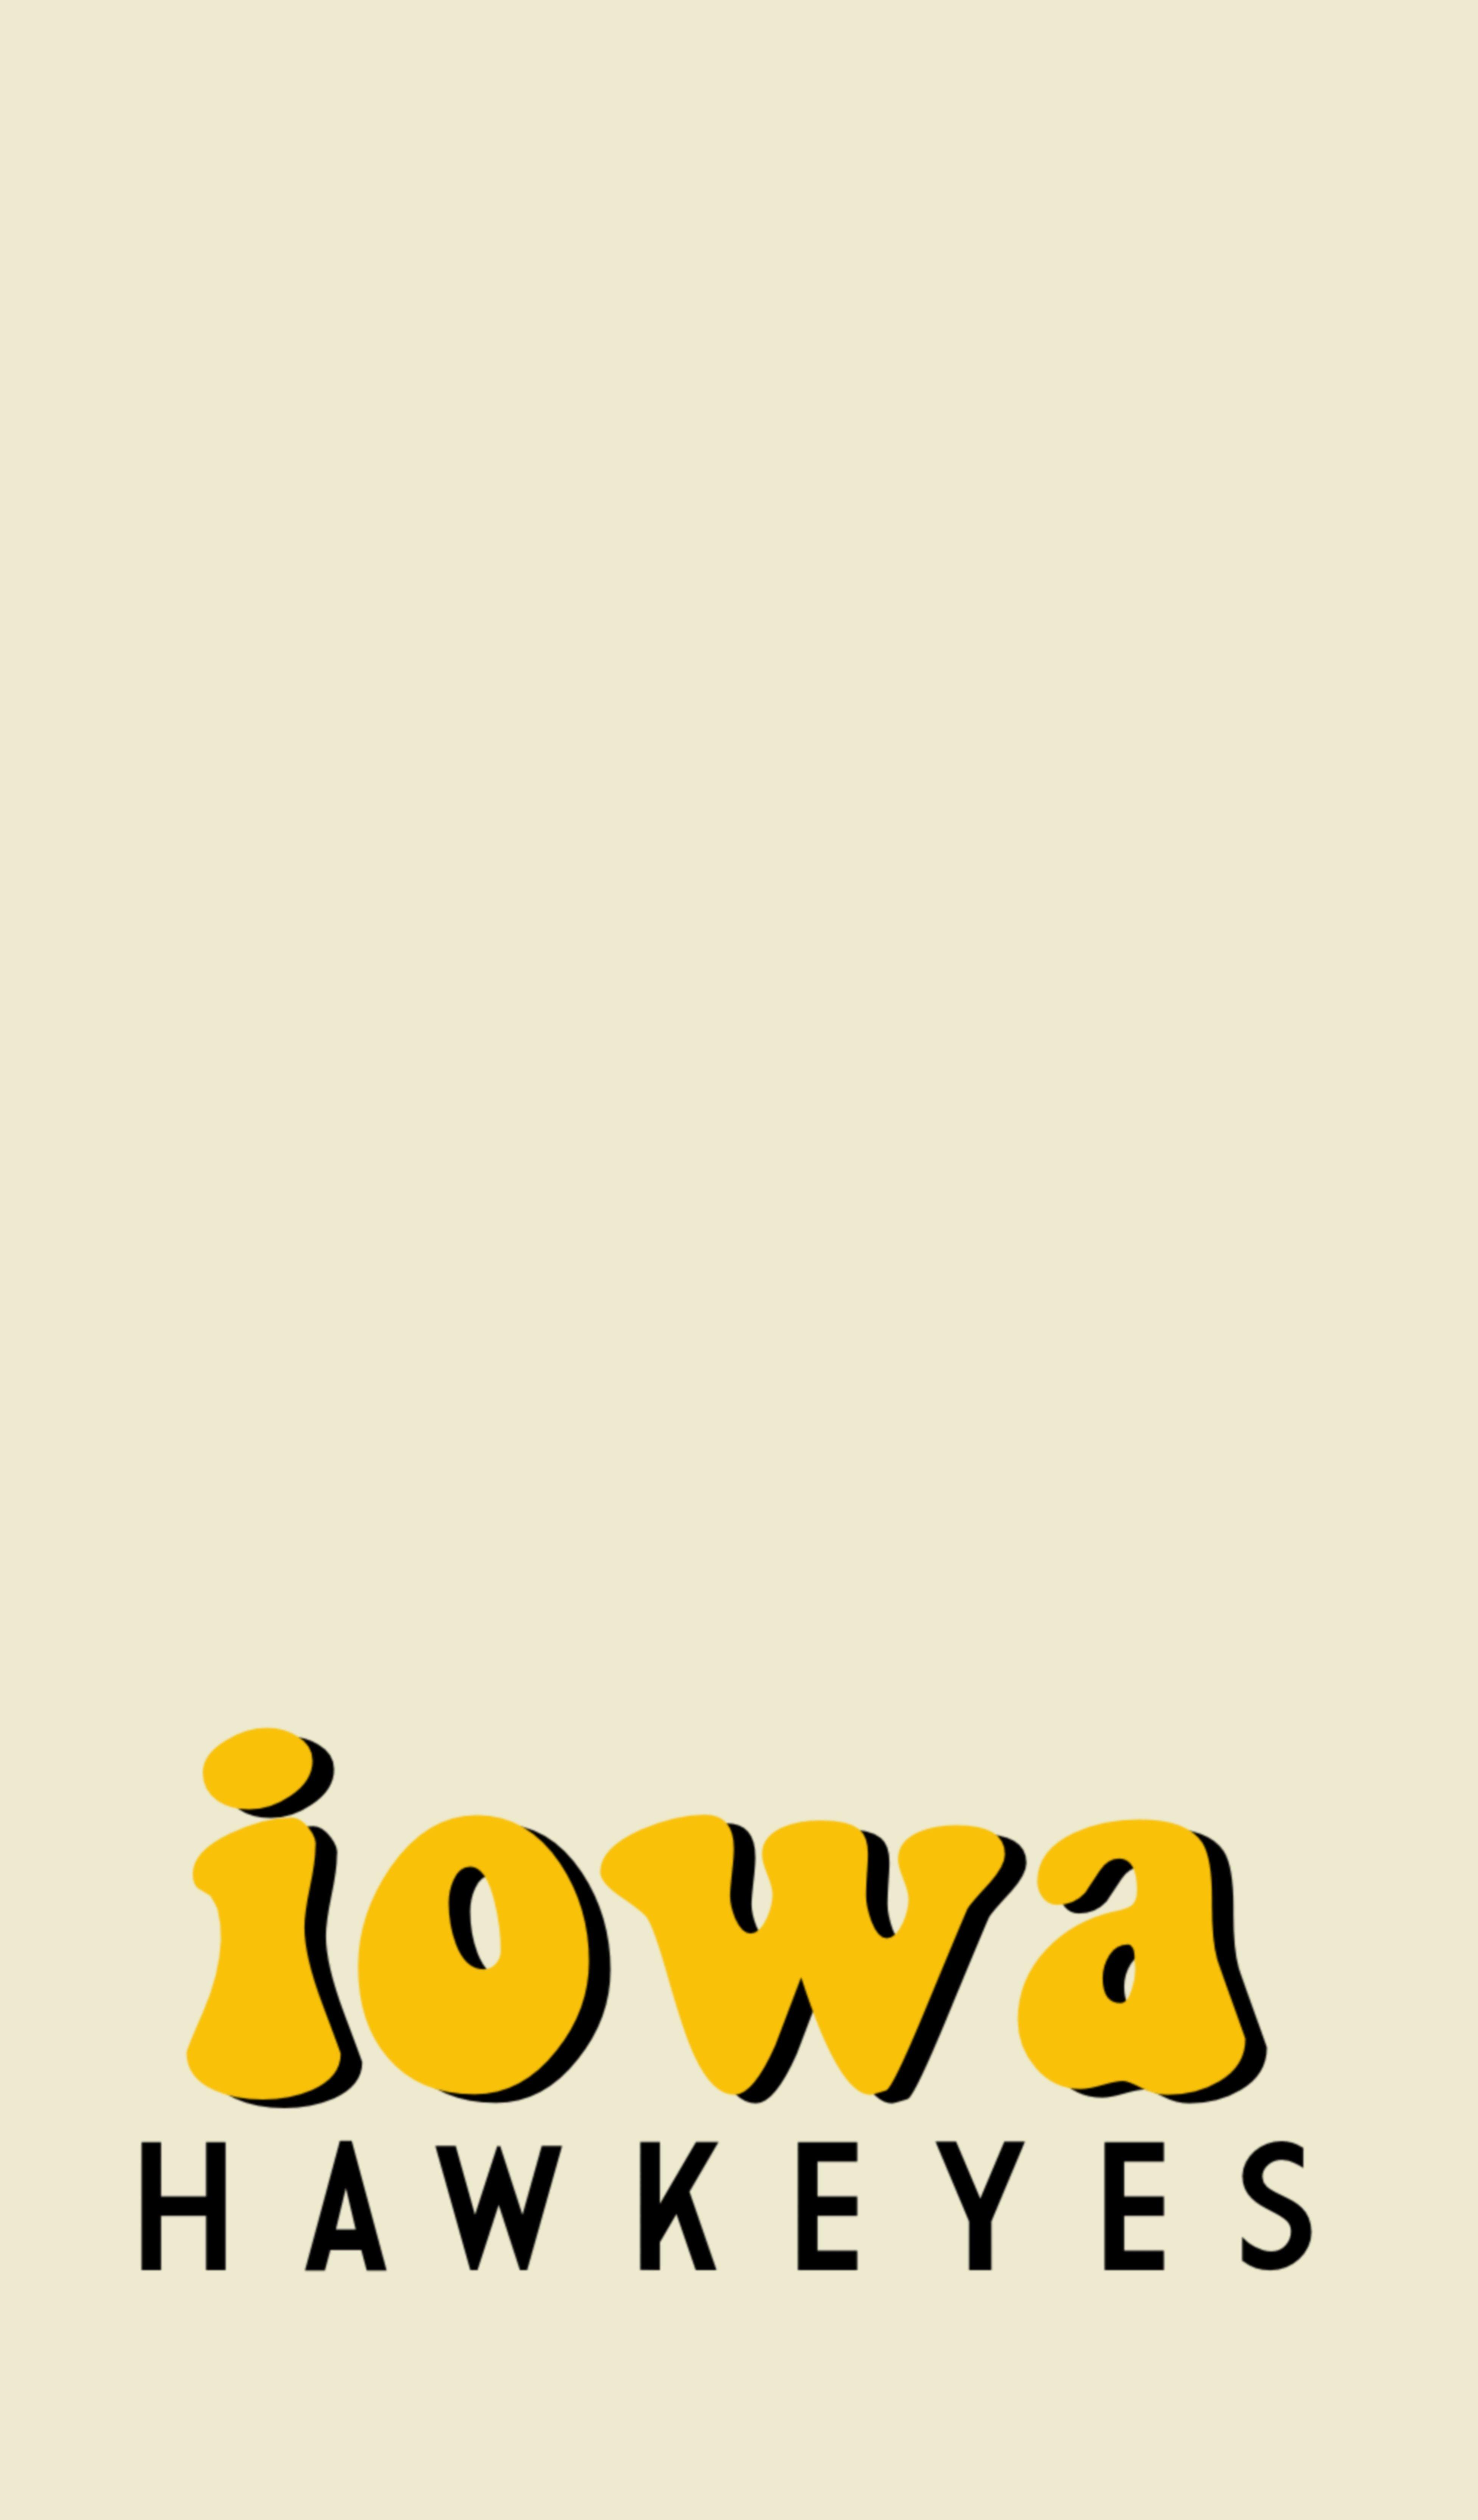 Iowa Hawkeyes Phone Wallpaper College Wallpaper Hawkeye Wallpaper Wallpaper